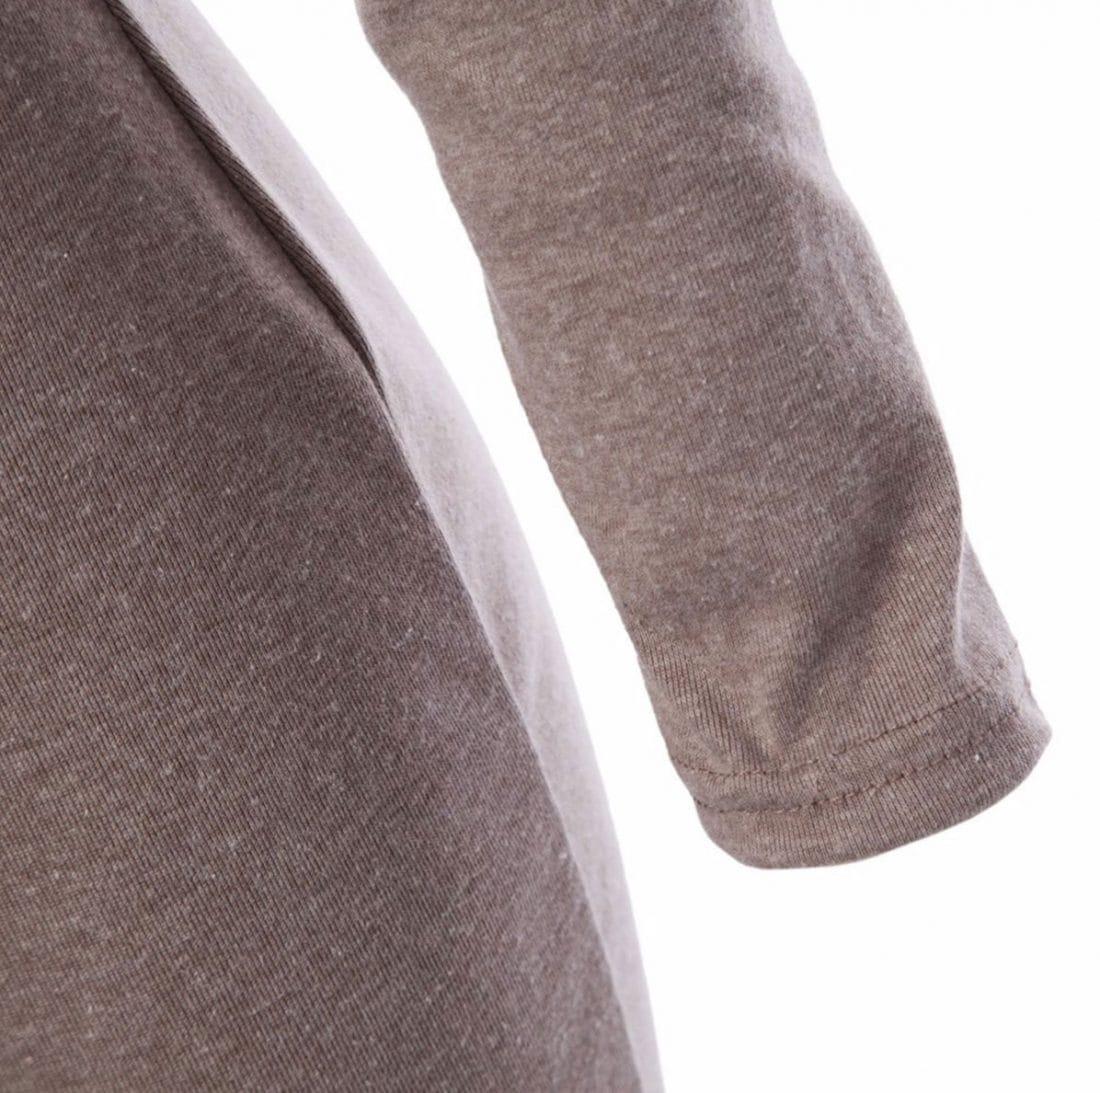 M0183 gray6 Long Sleeve Dresses maureens.com boutique